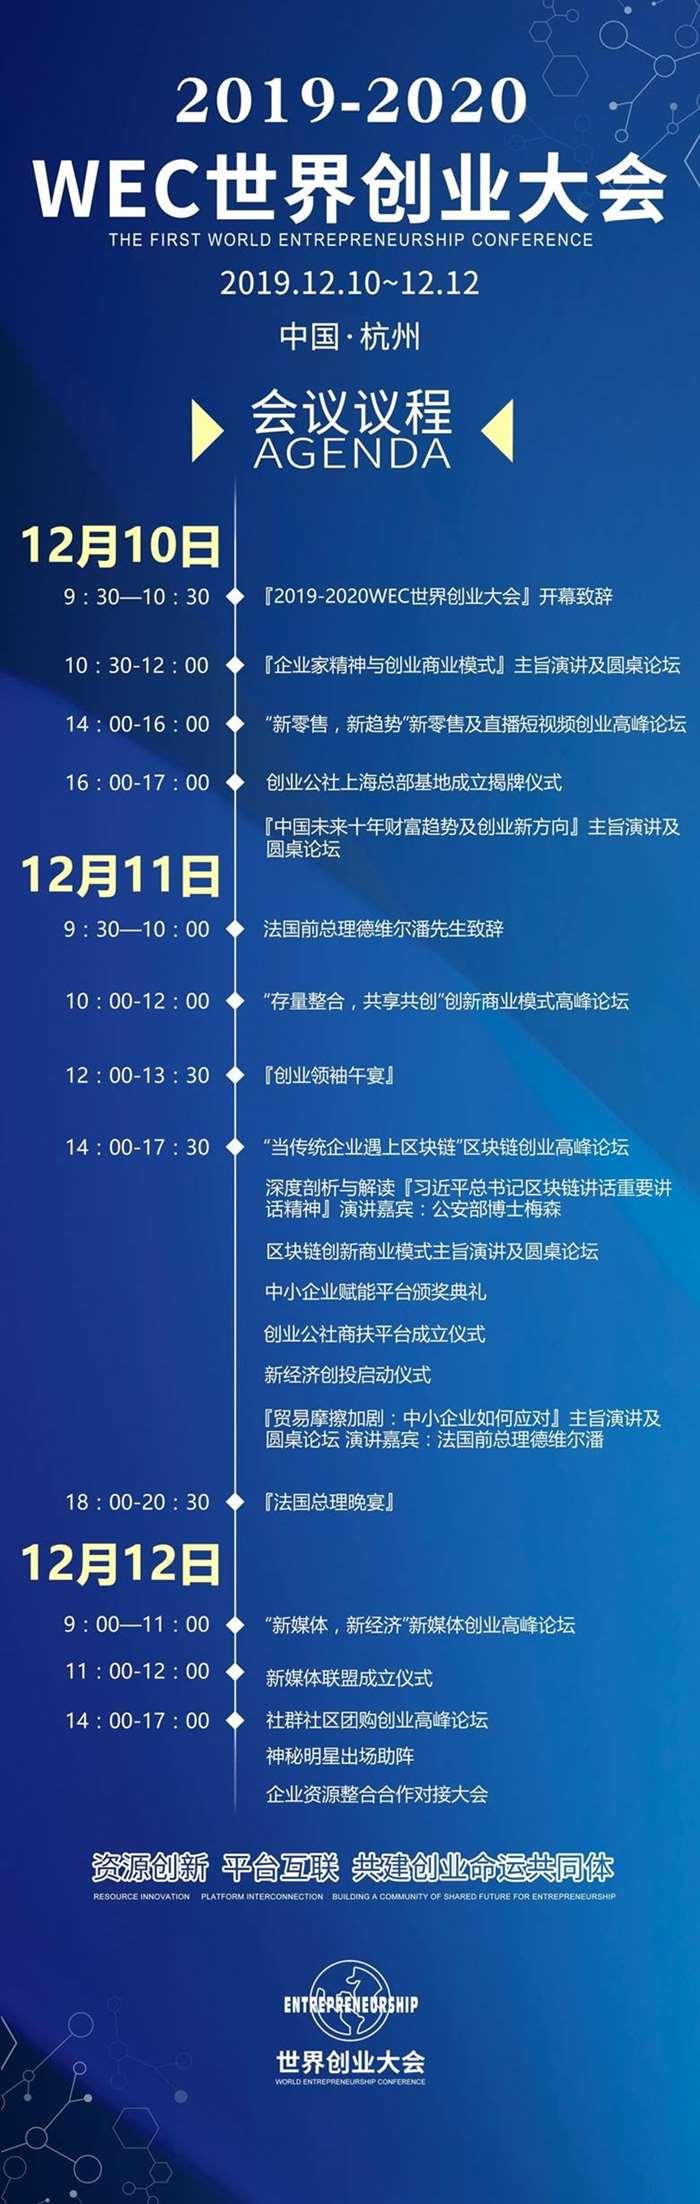 http://www.huodongxing.com/file/20181116/1573241815317/293615748413411.jpg